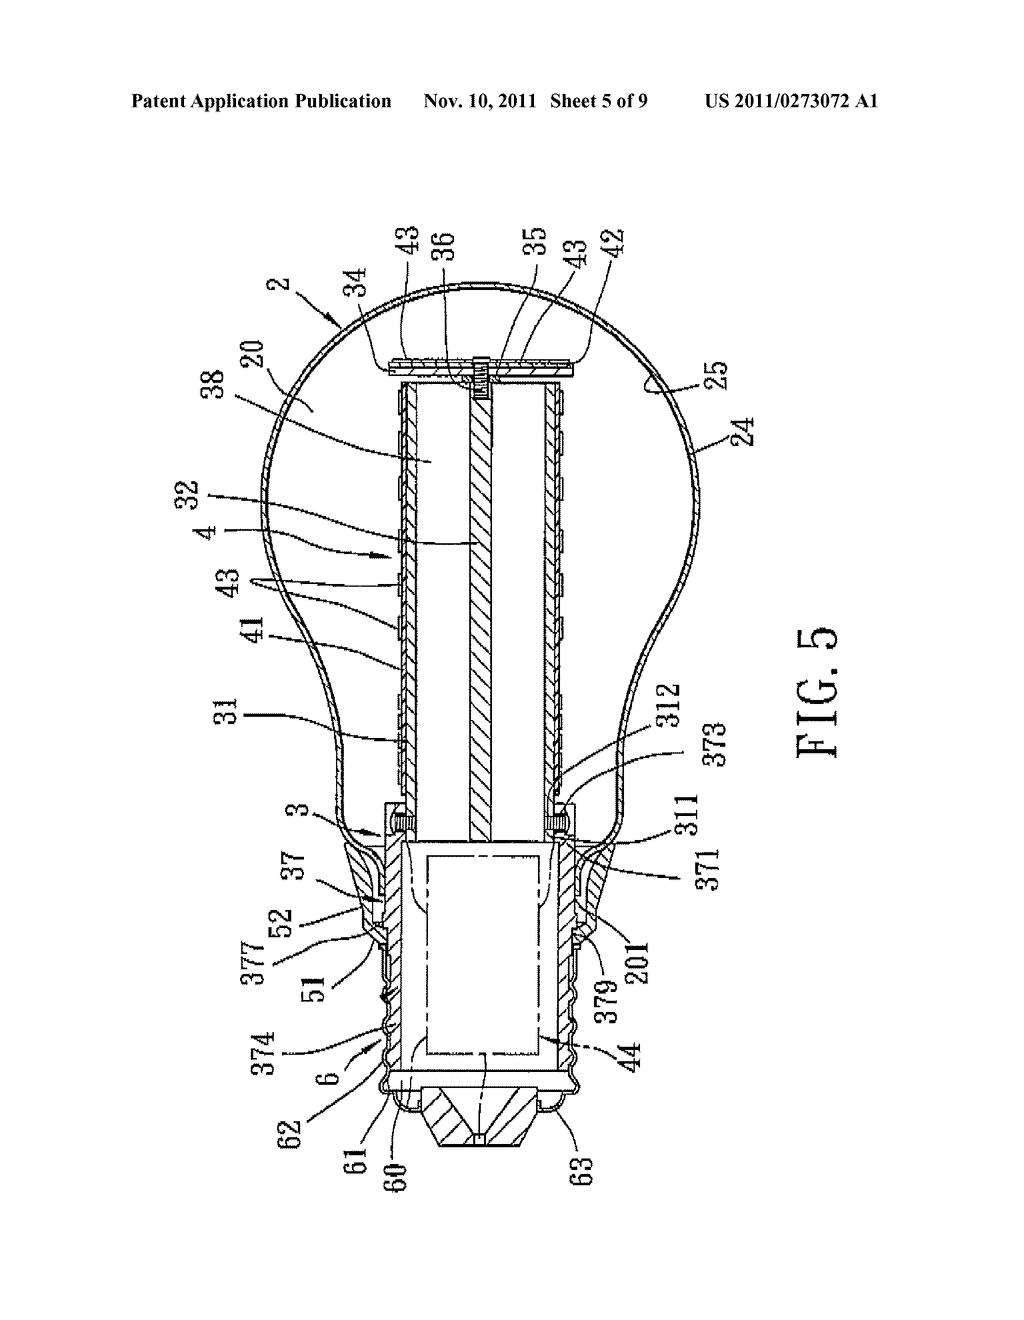 Schematic Flashlight Bulb Electrical Wiring Diagram Led Circuit Of Free Energy Light Library Rh 62 Yoobi De